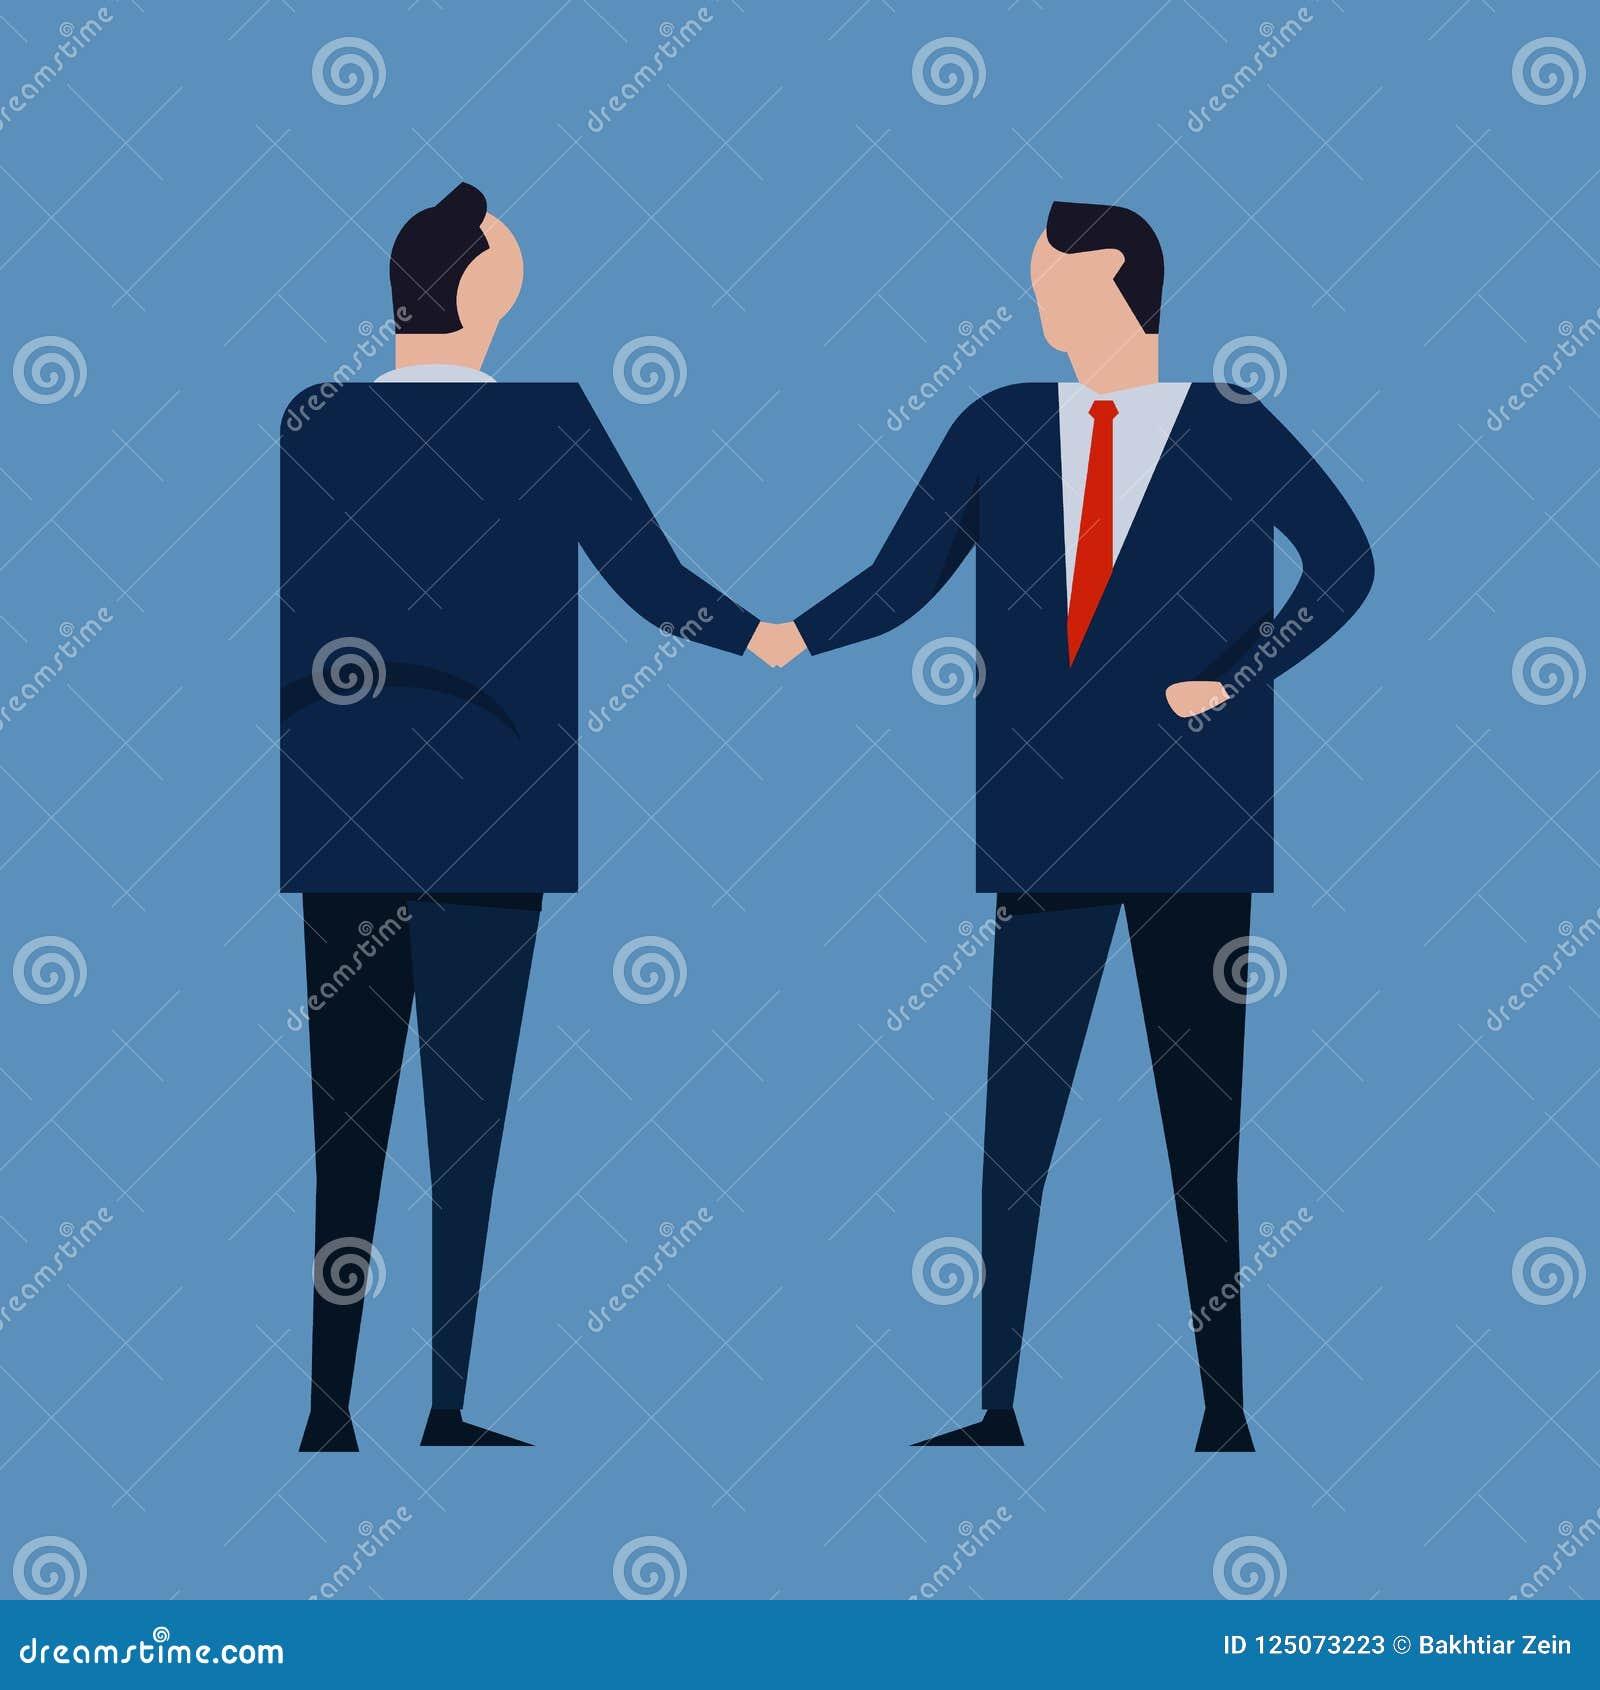 Contract Agreement Business People Standing Handshake Wearing Suite